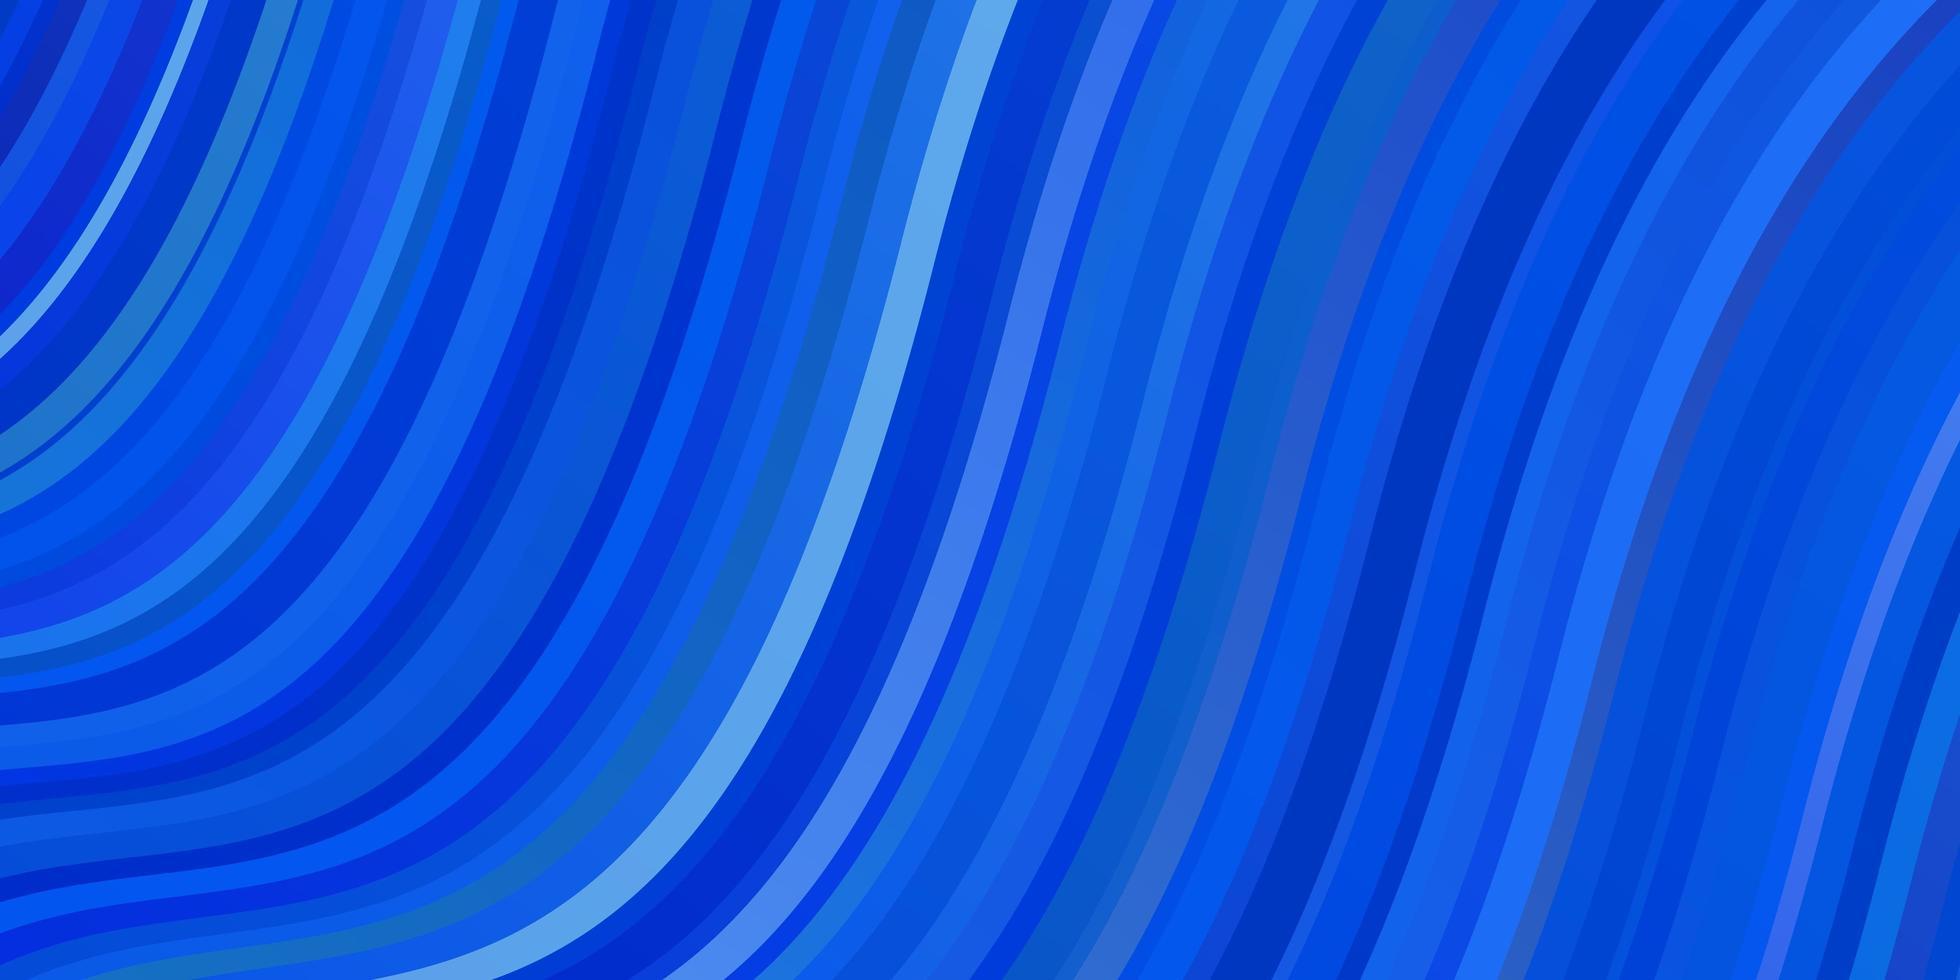 diseño de vector azul claro con curvas.